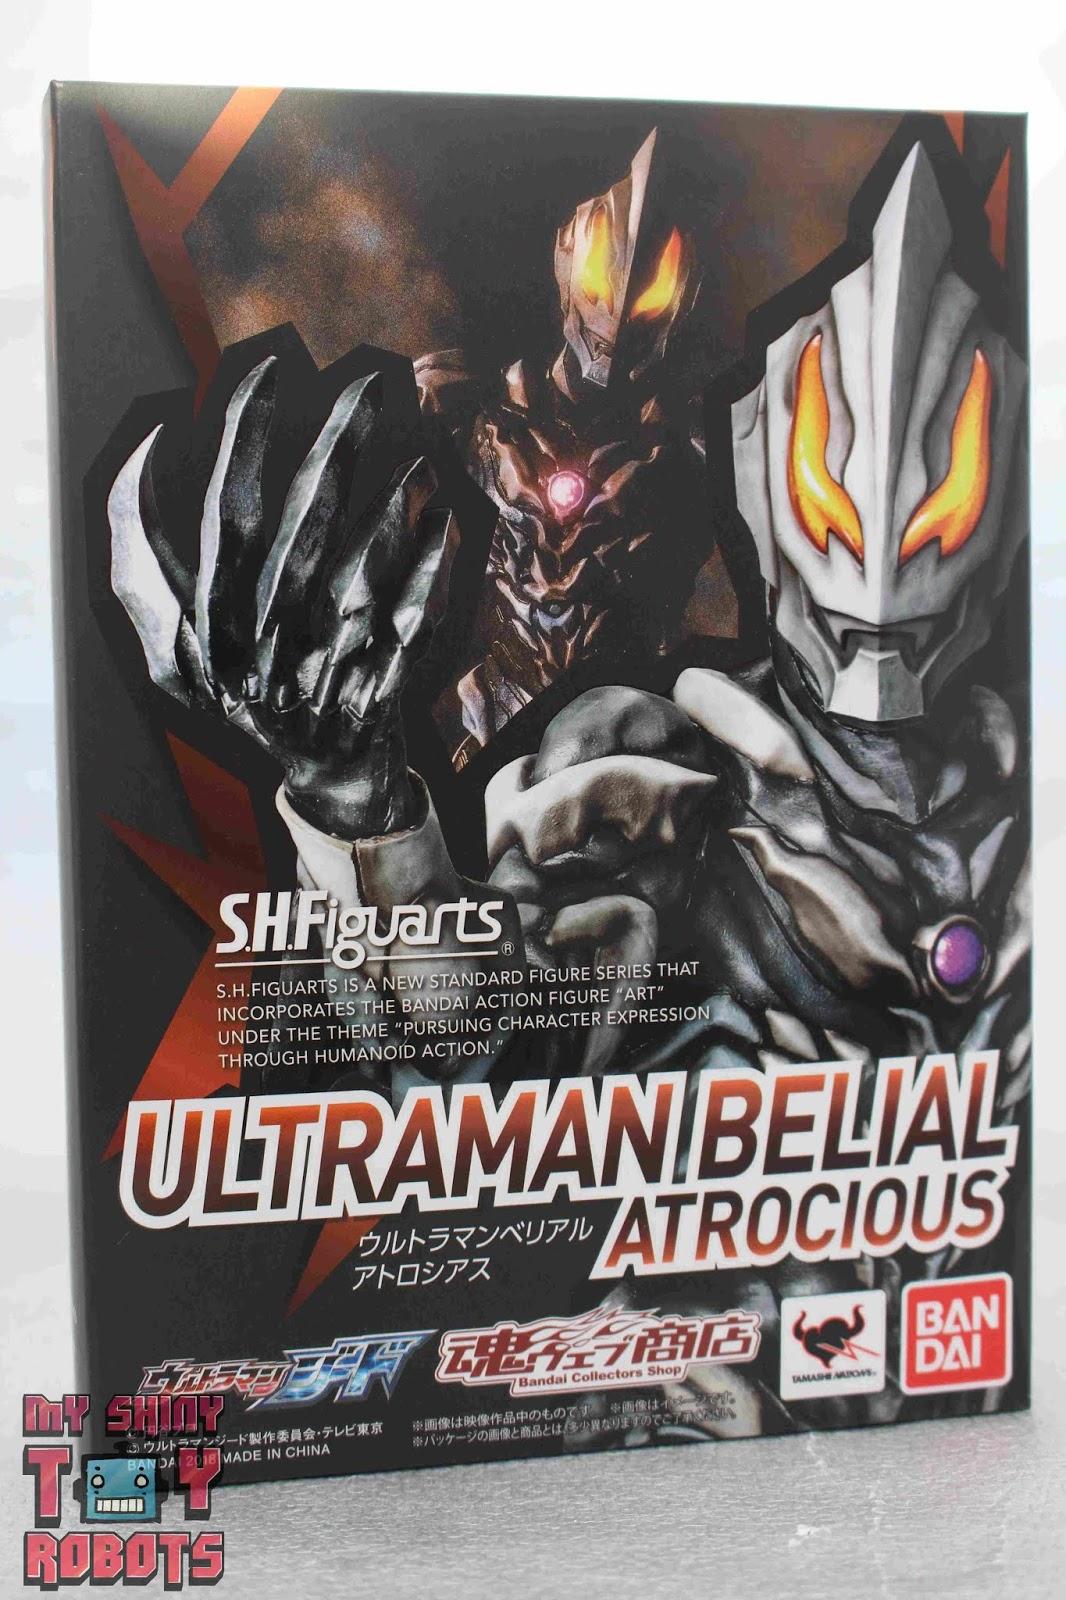 Figuarts Ultraman Belial Ultraman Series Action Figure Bandai Tamashii Nations Tamashii Nations Bandai S.H